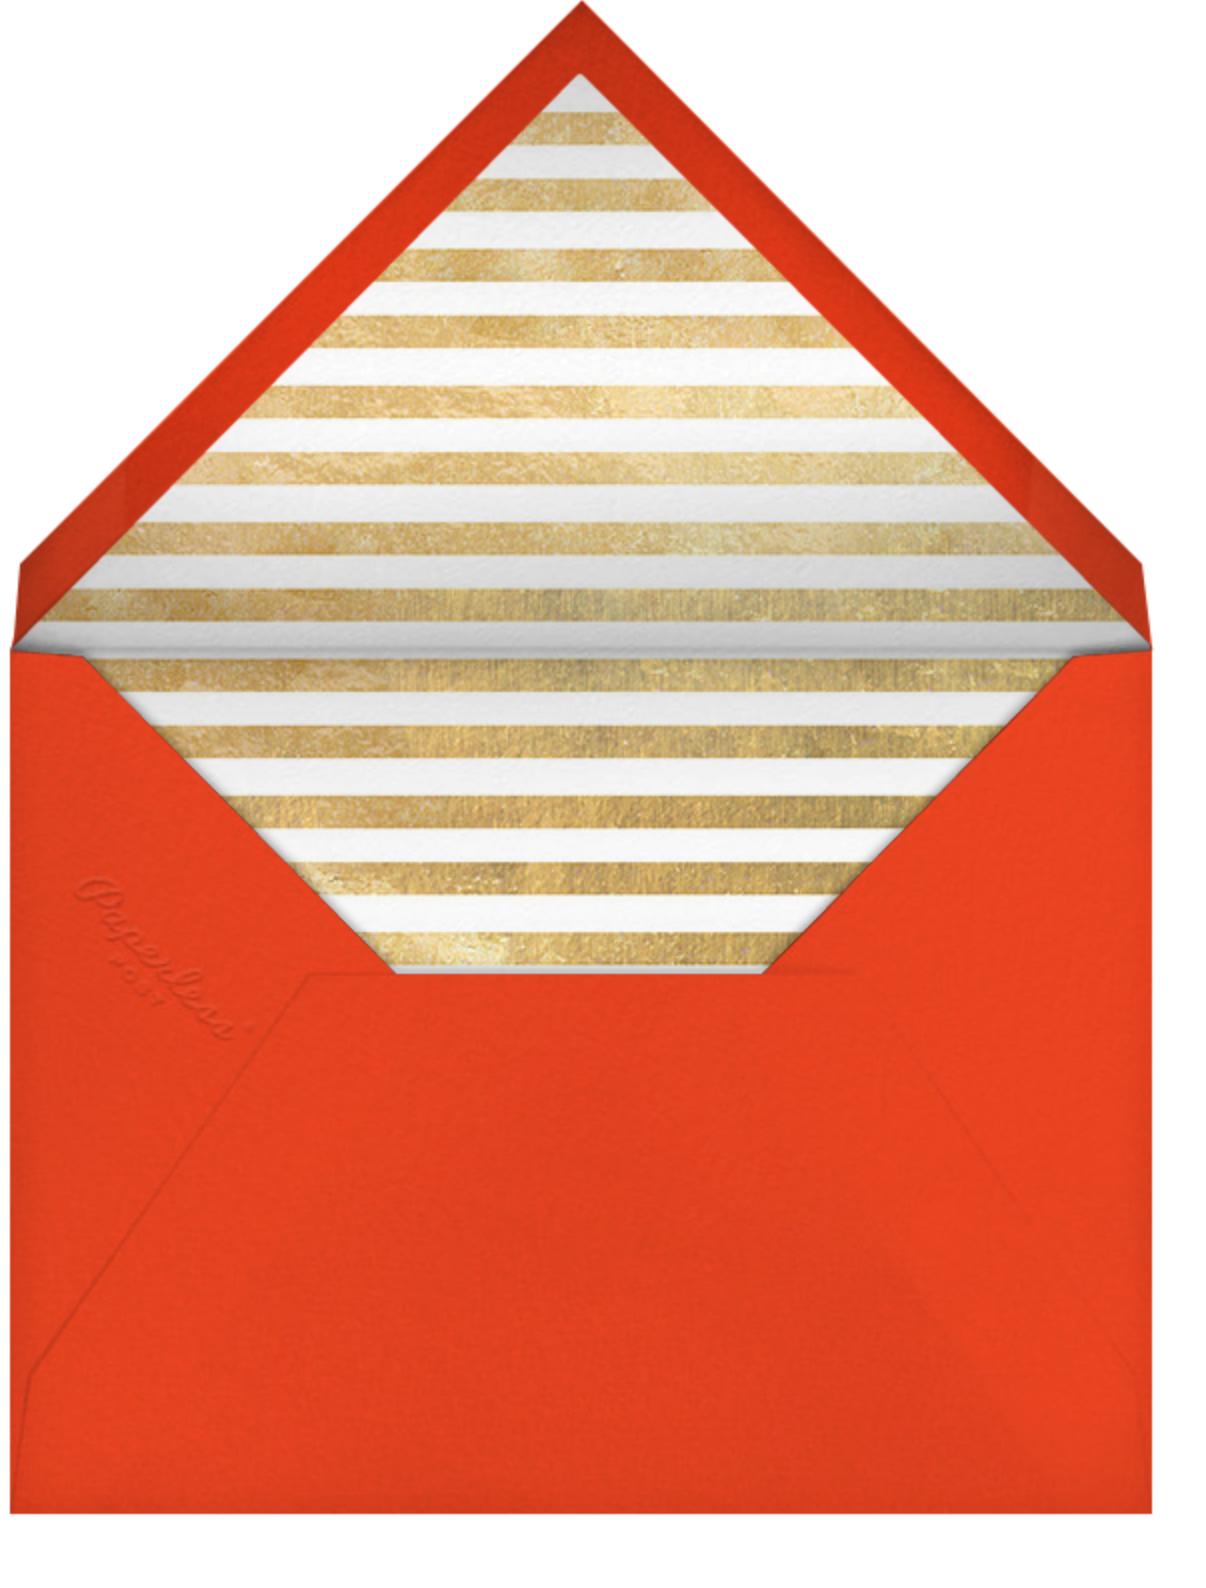 Bird and Beard - kate spade new york - null - envelope back